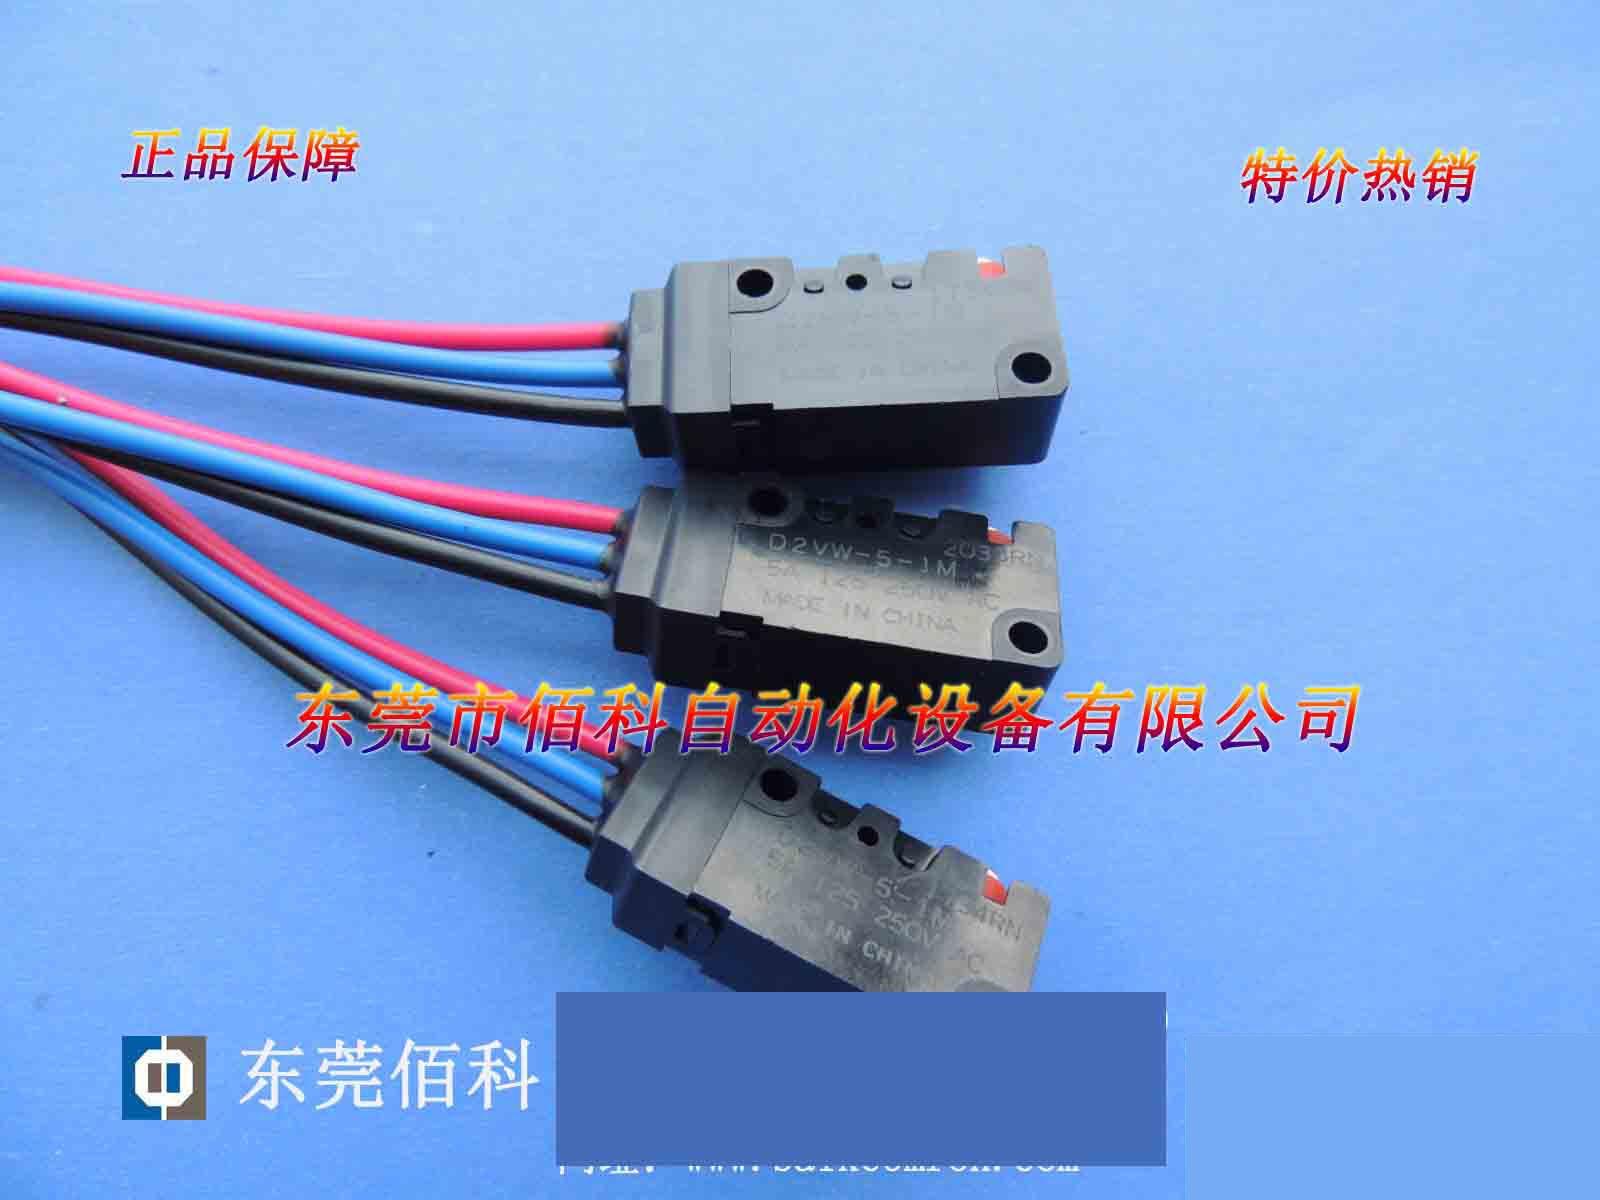 New Micro Switch D2VW-5-1M